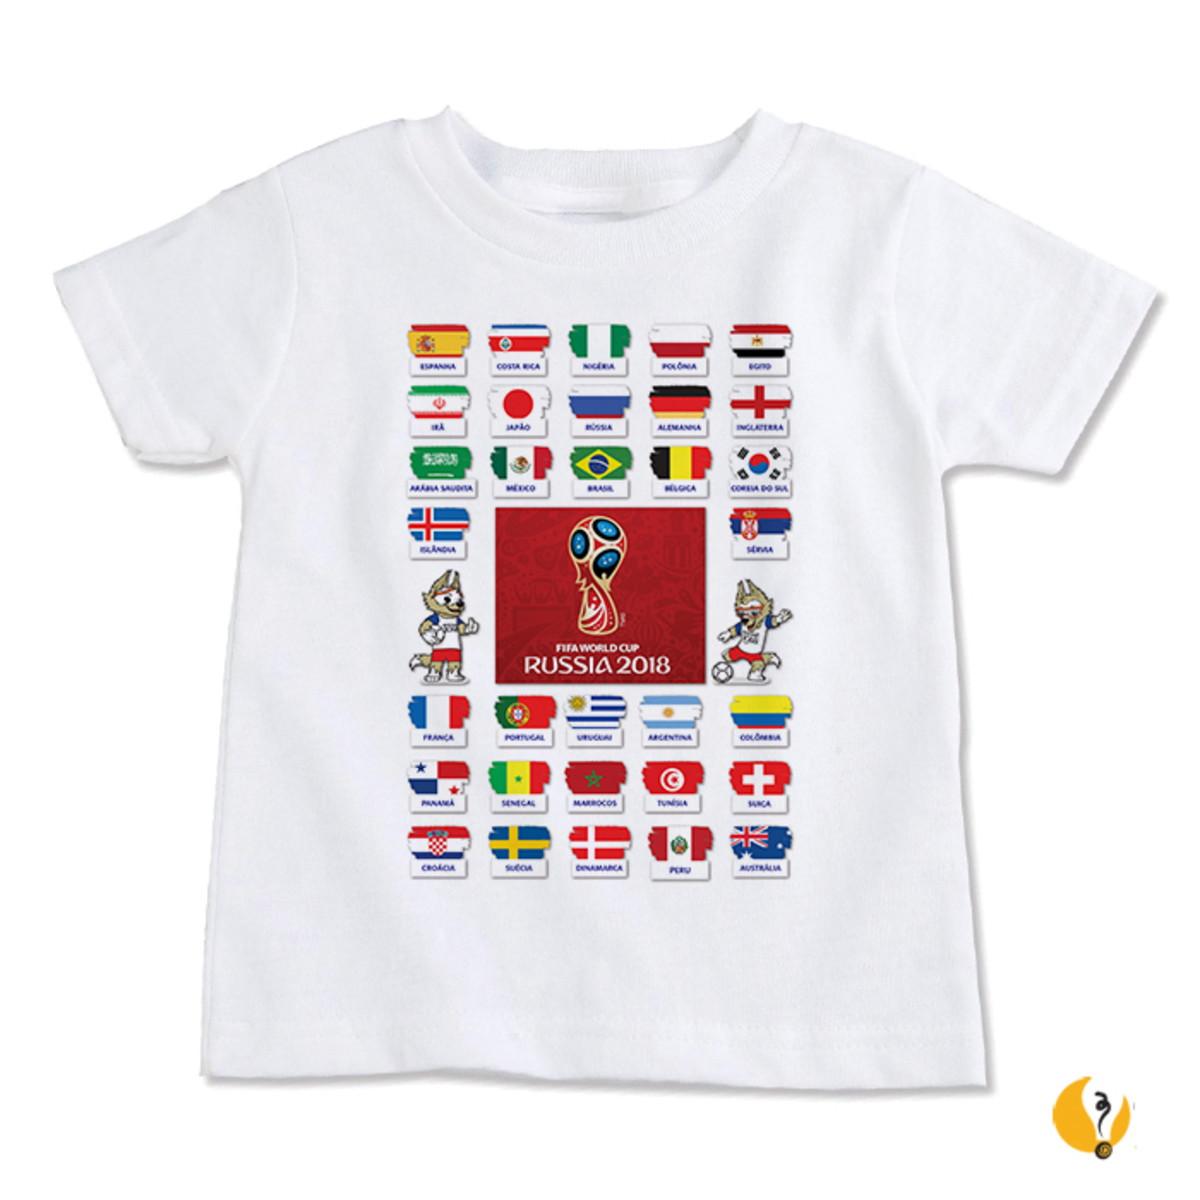 5a6c54507 Zoom · Camiseta personalizada